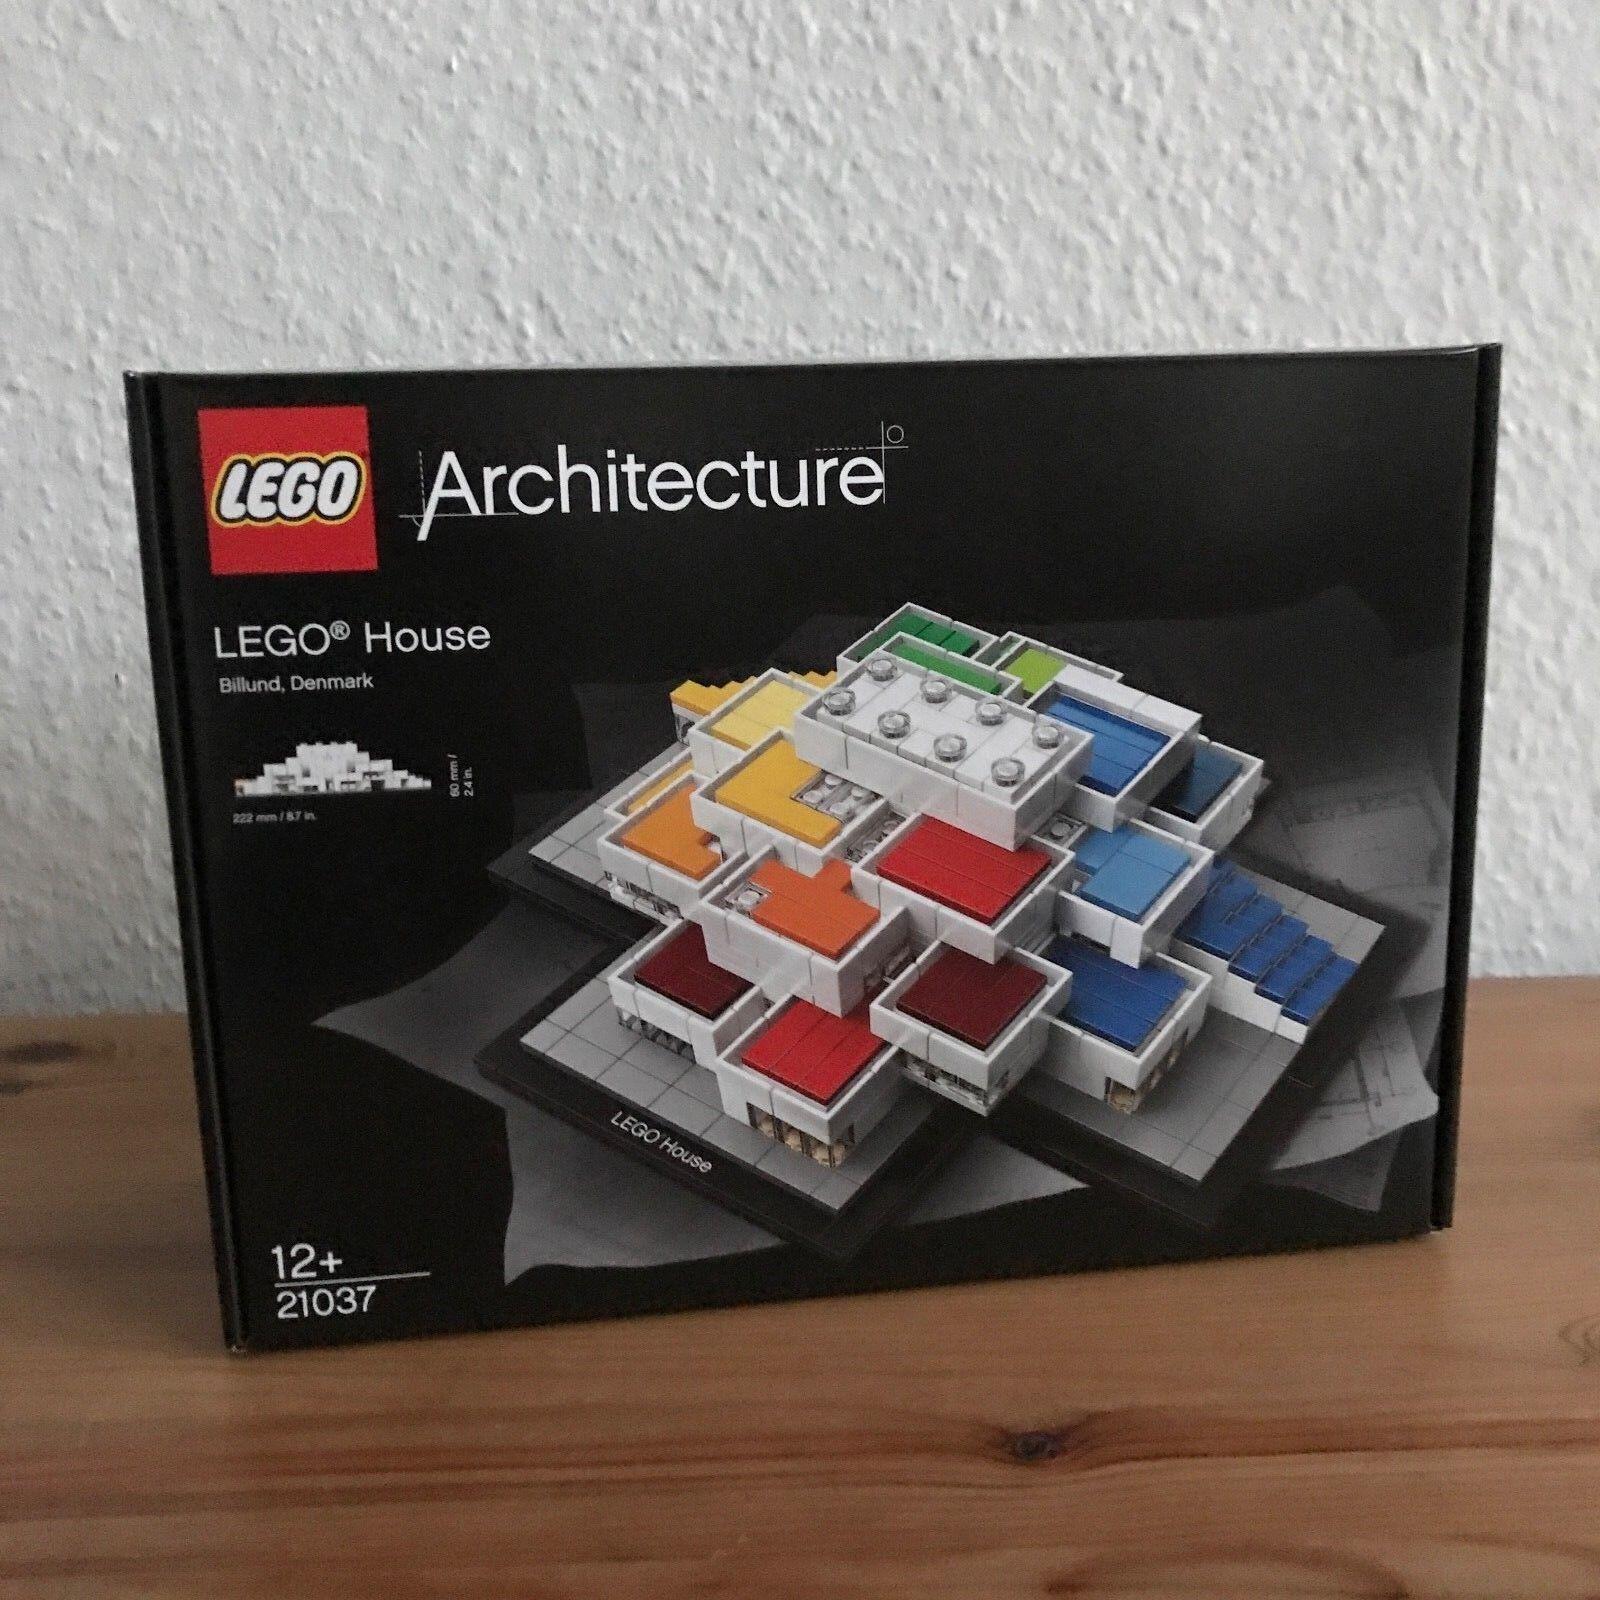 Lego set 21037  Lego House (Exklusiv -Lego butik i Billund, DK